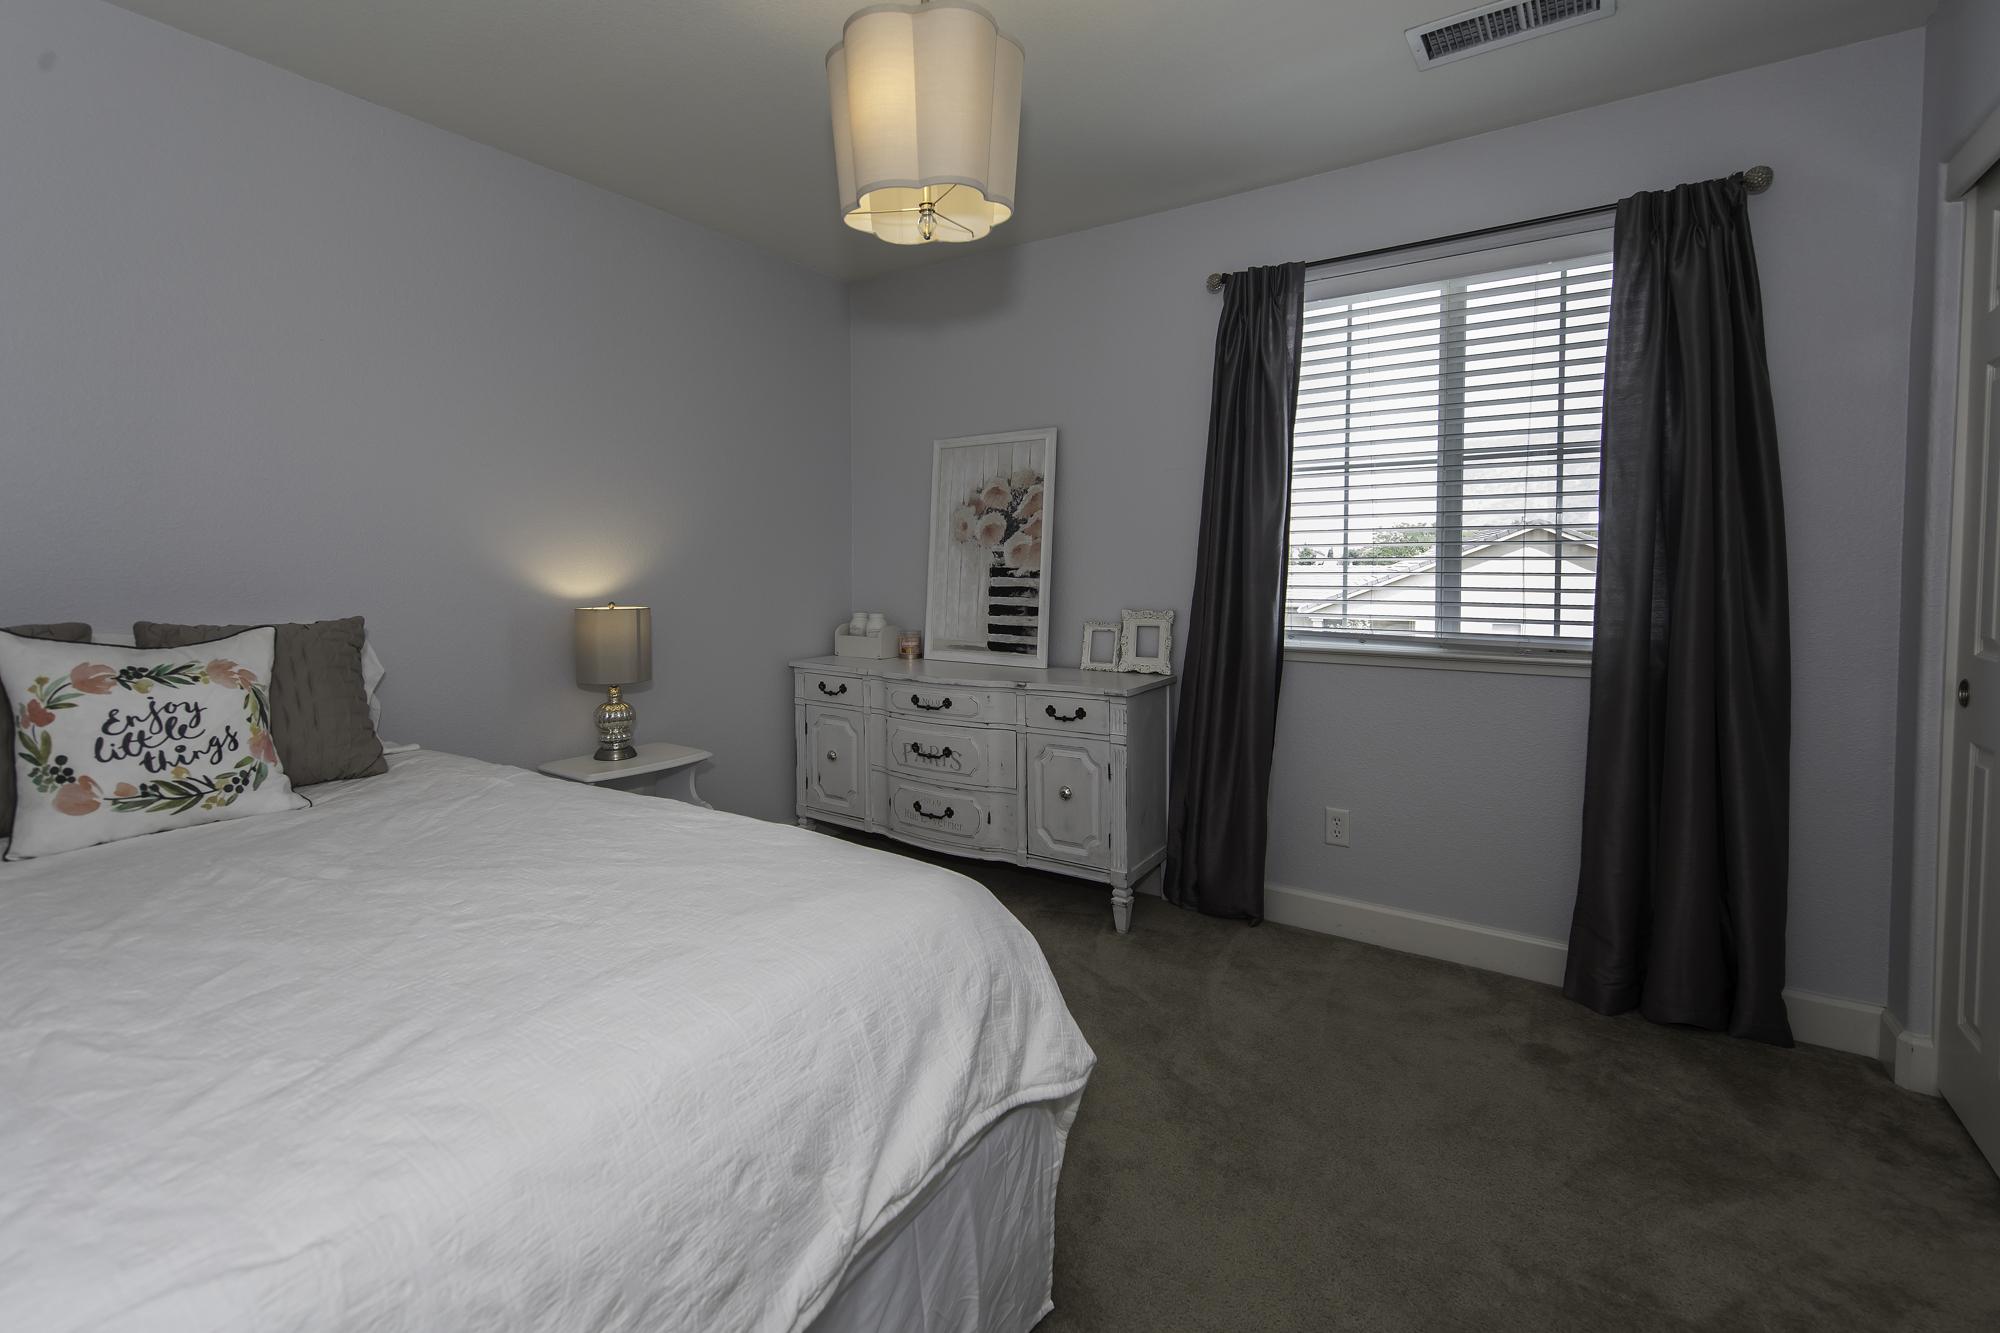 VerazaeDr11305-Room1